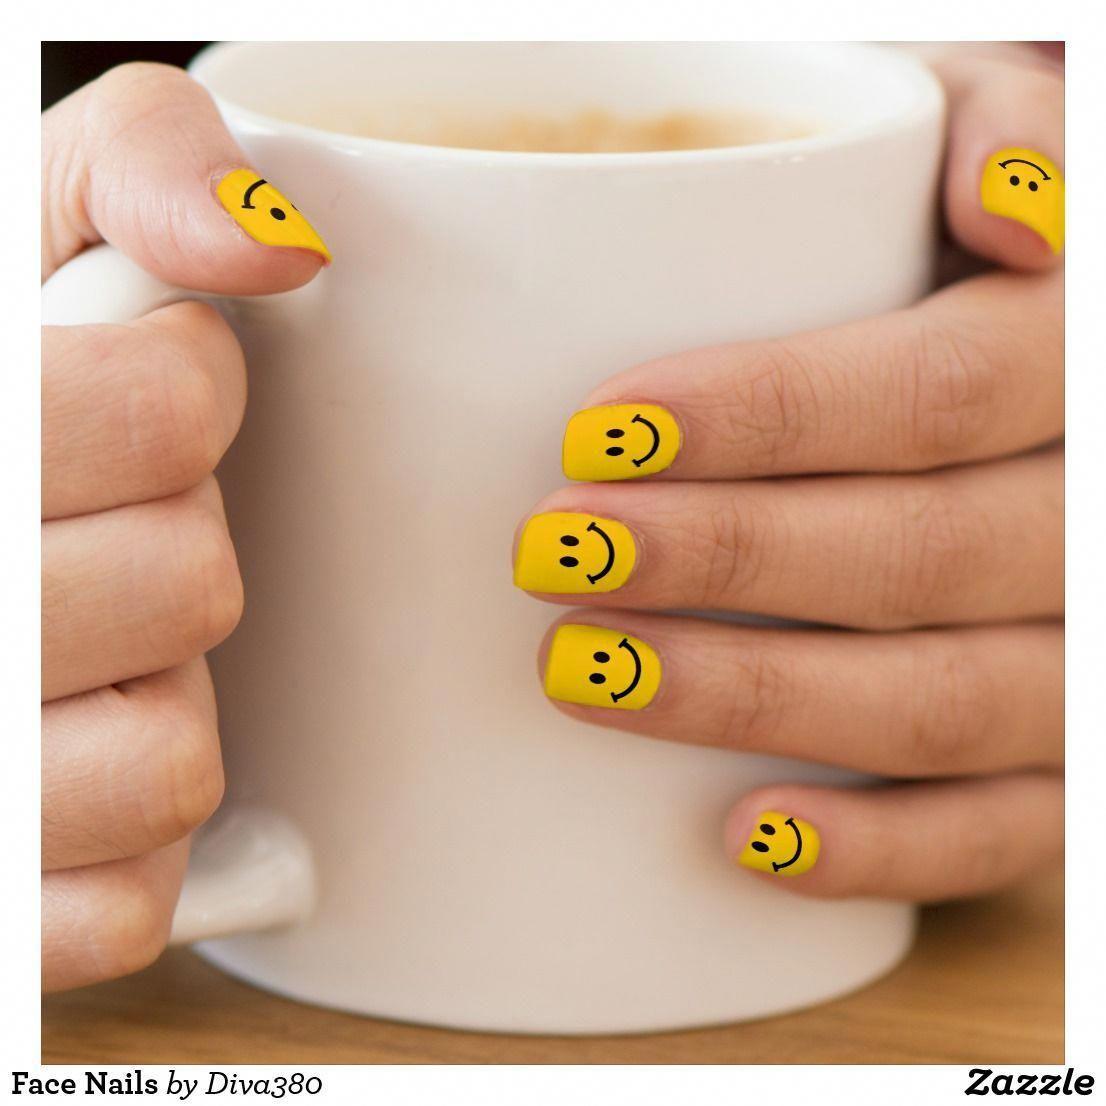 Face Nails Minx Nail Art | Zazzle.com